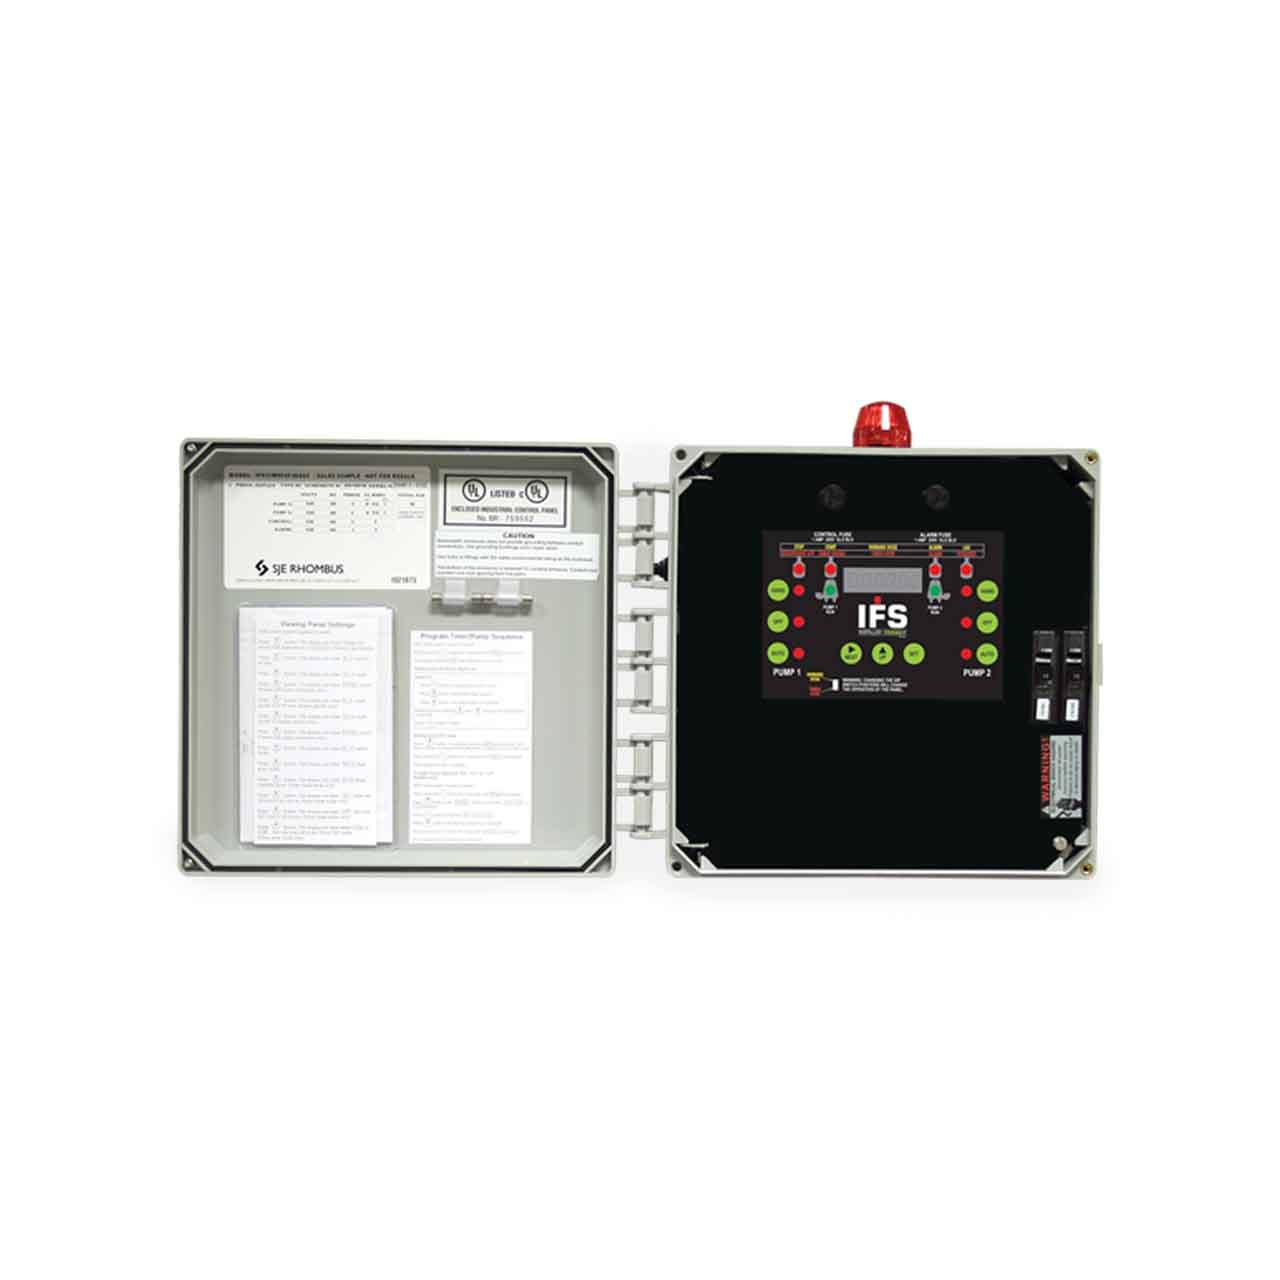 hight resolution of sje rhombus sje rhombus model ifs single phase 120 208 240v duplex control panel cp sjeifsd